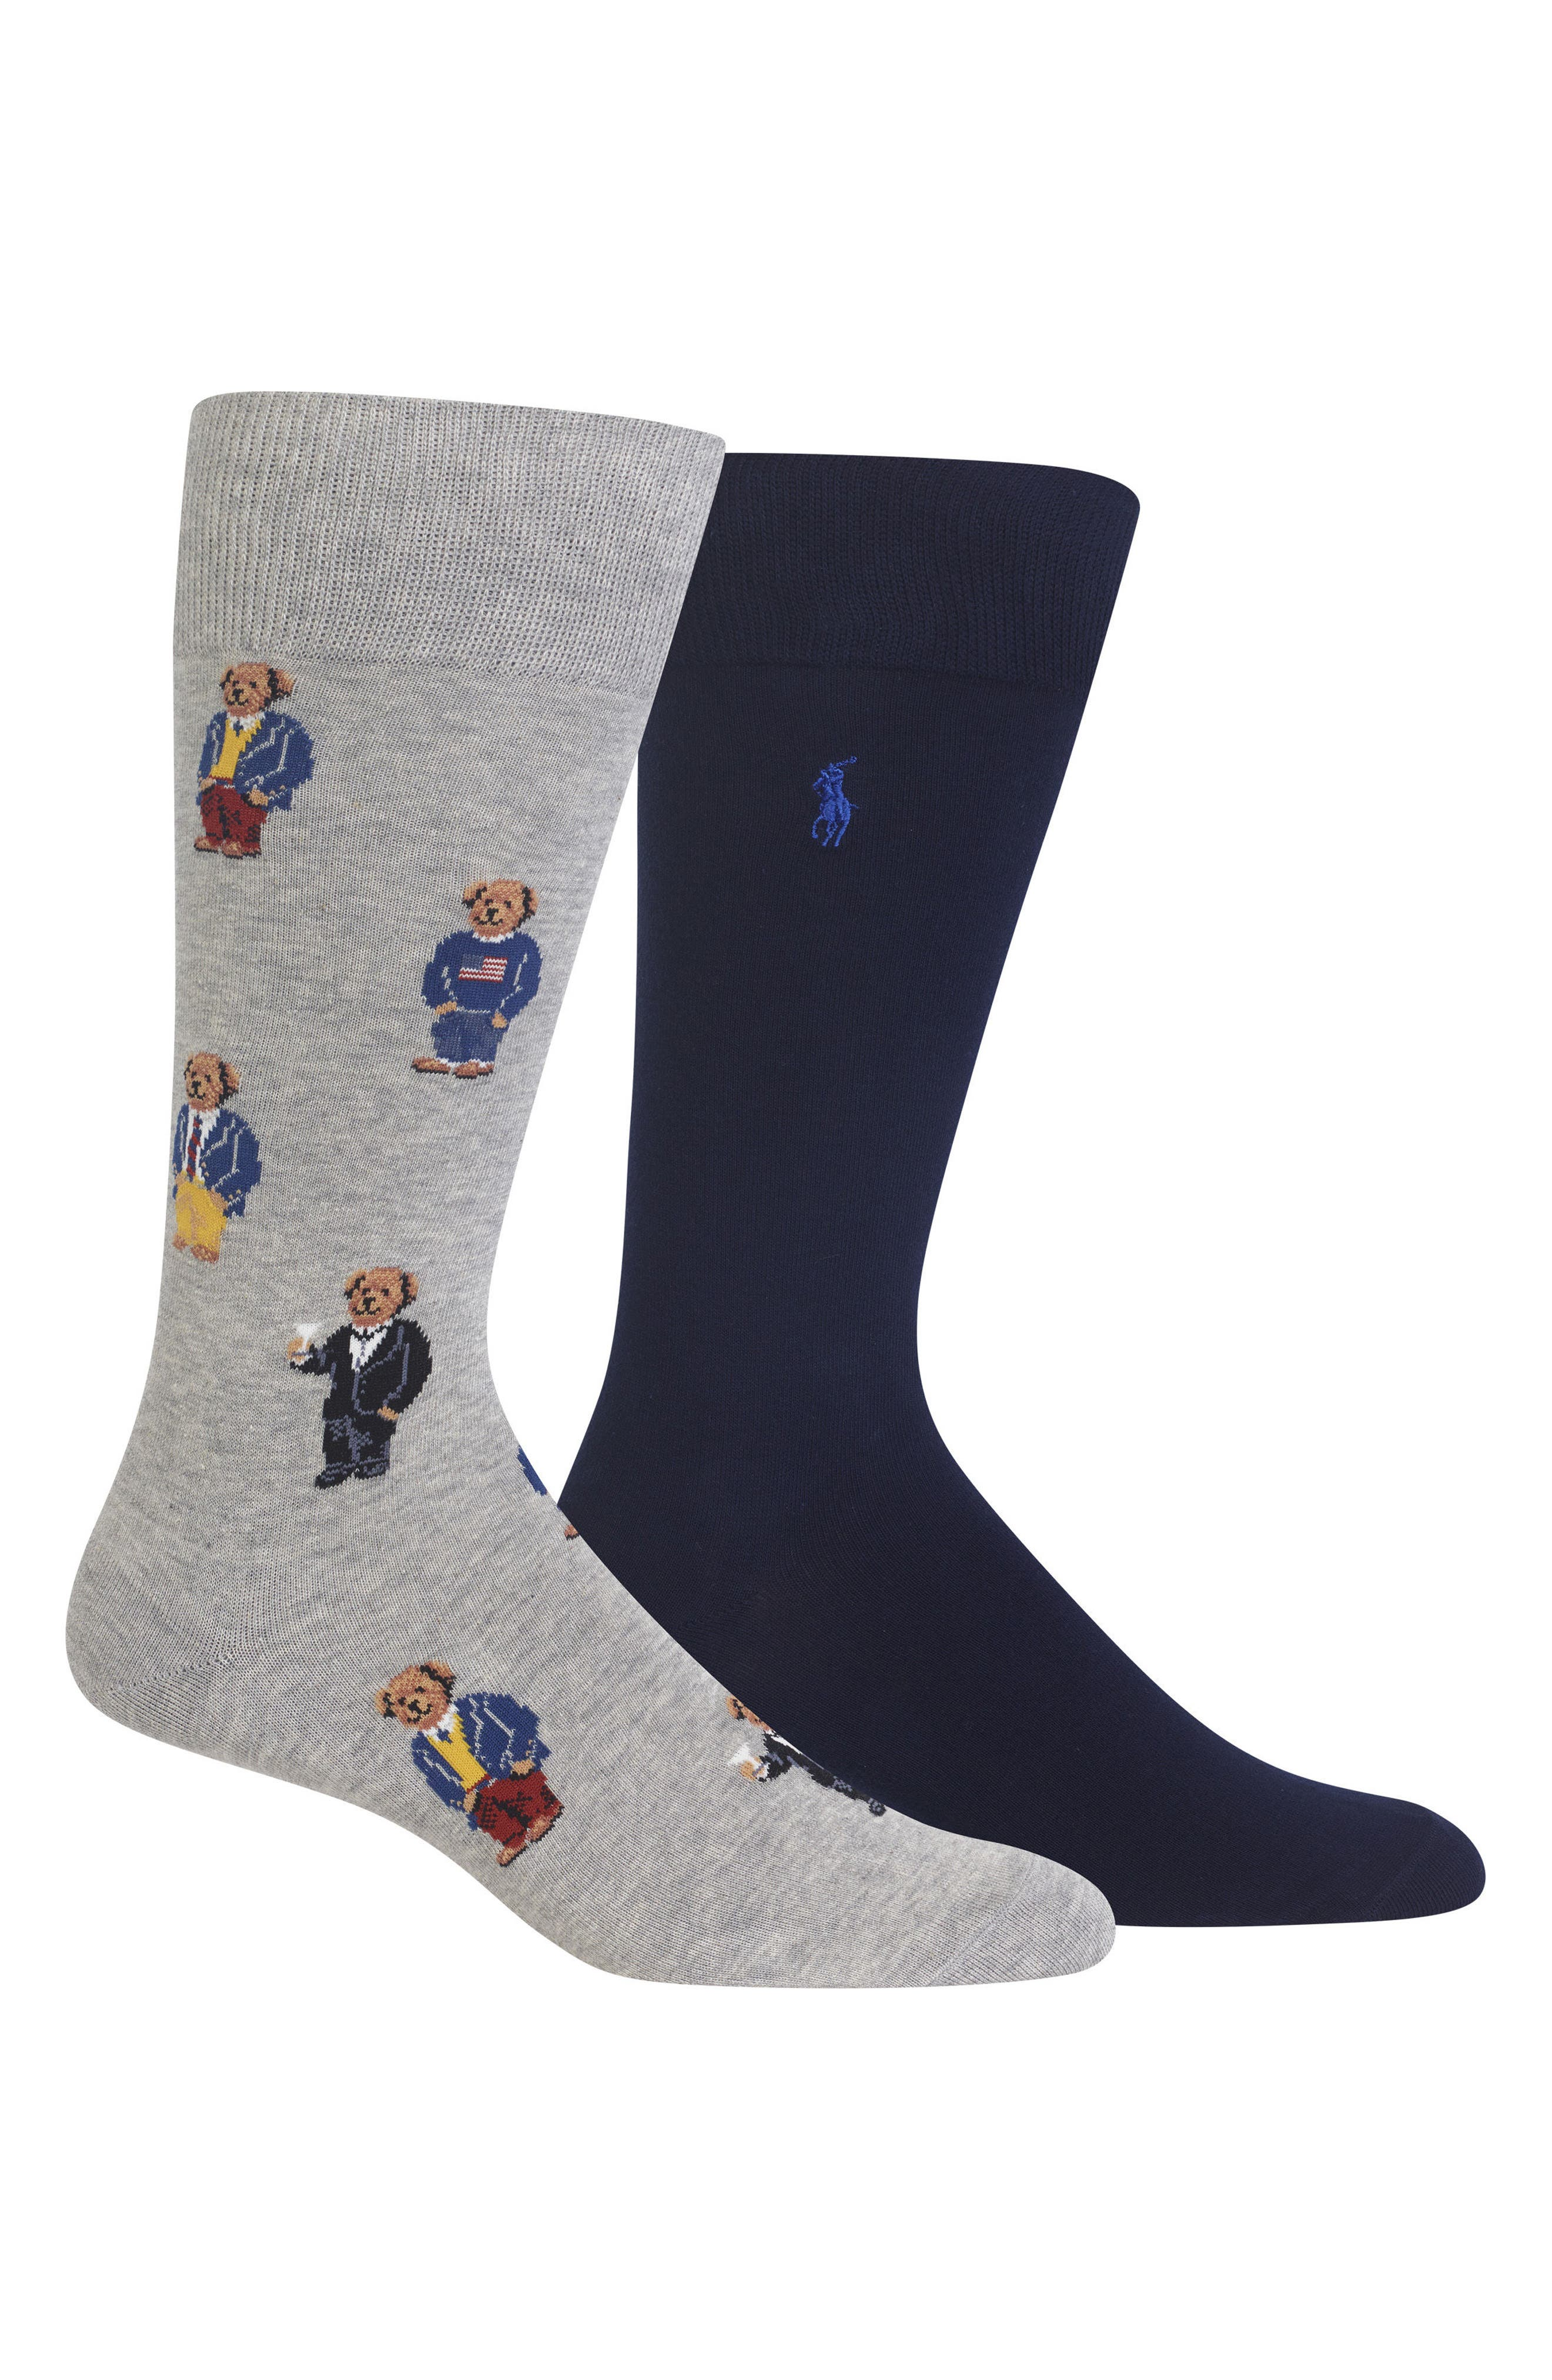 2-Pack Socks,                         Main,                         color, Grey/ Navy